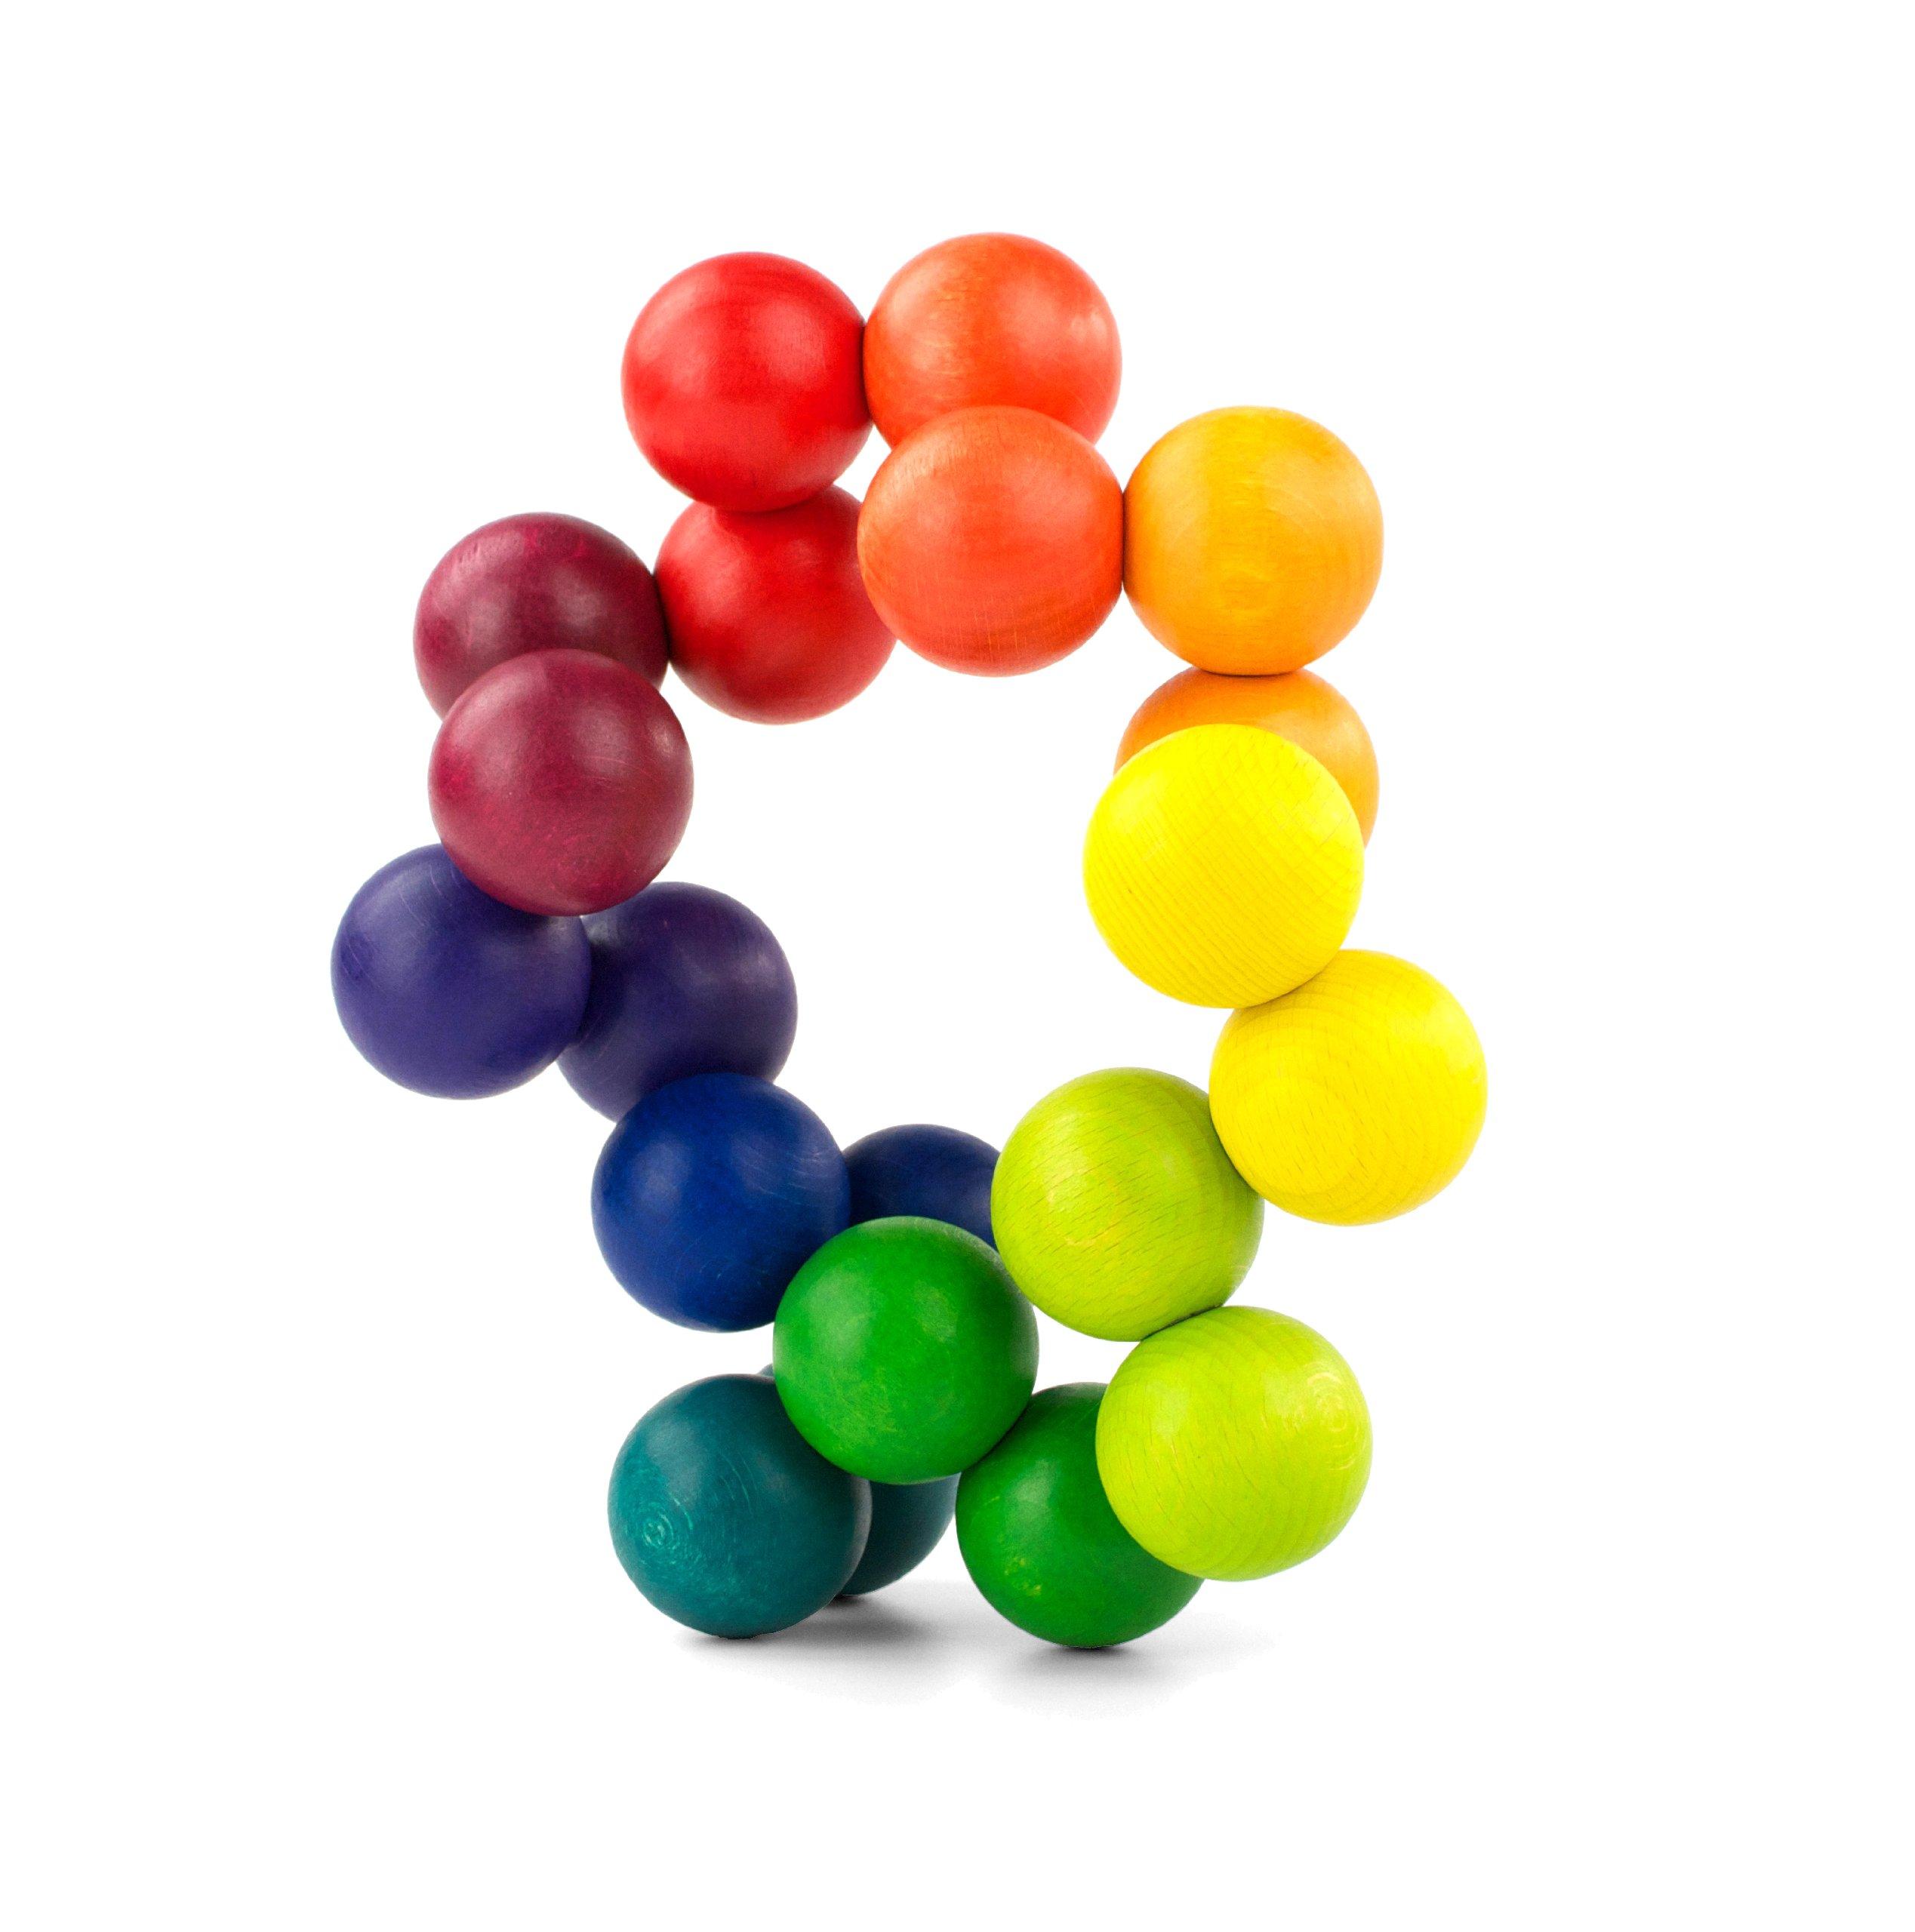 Playable ART Ball by playableART